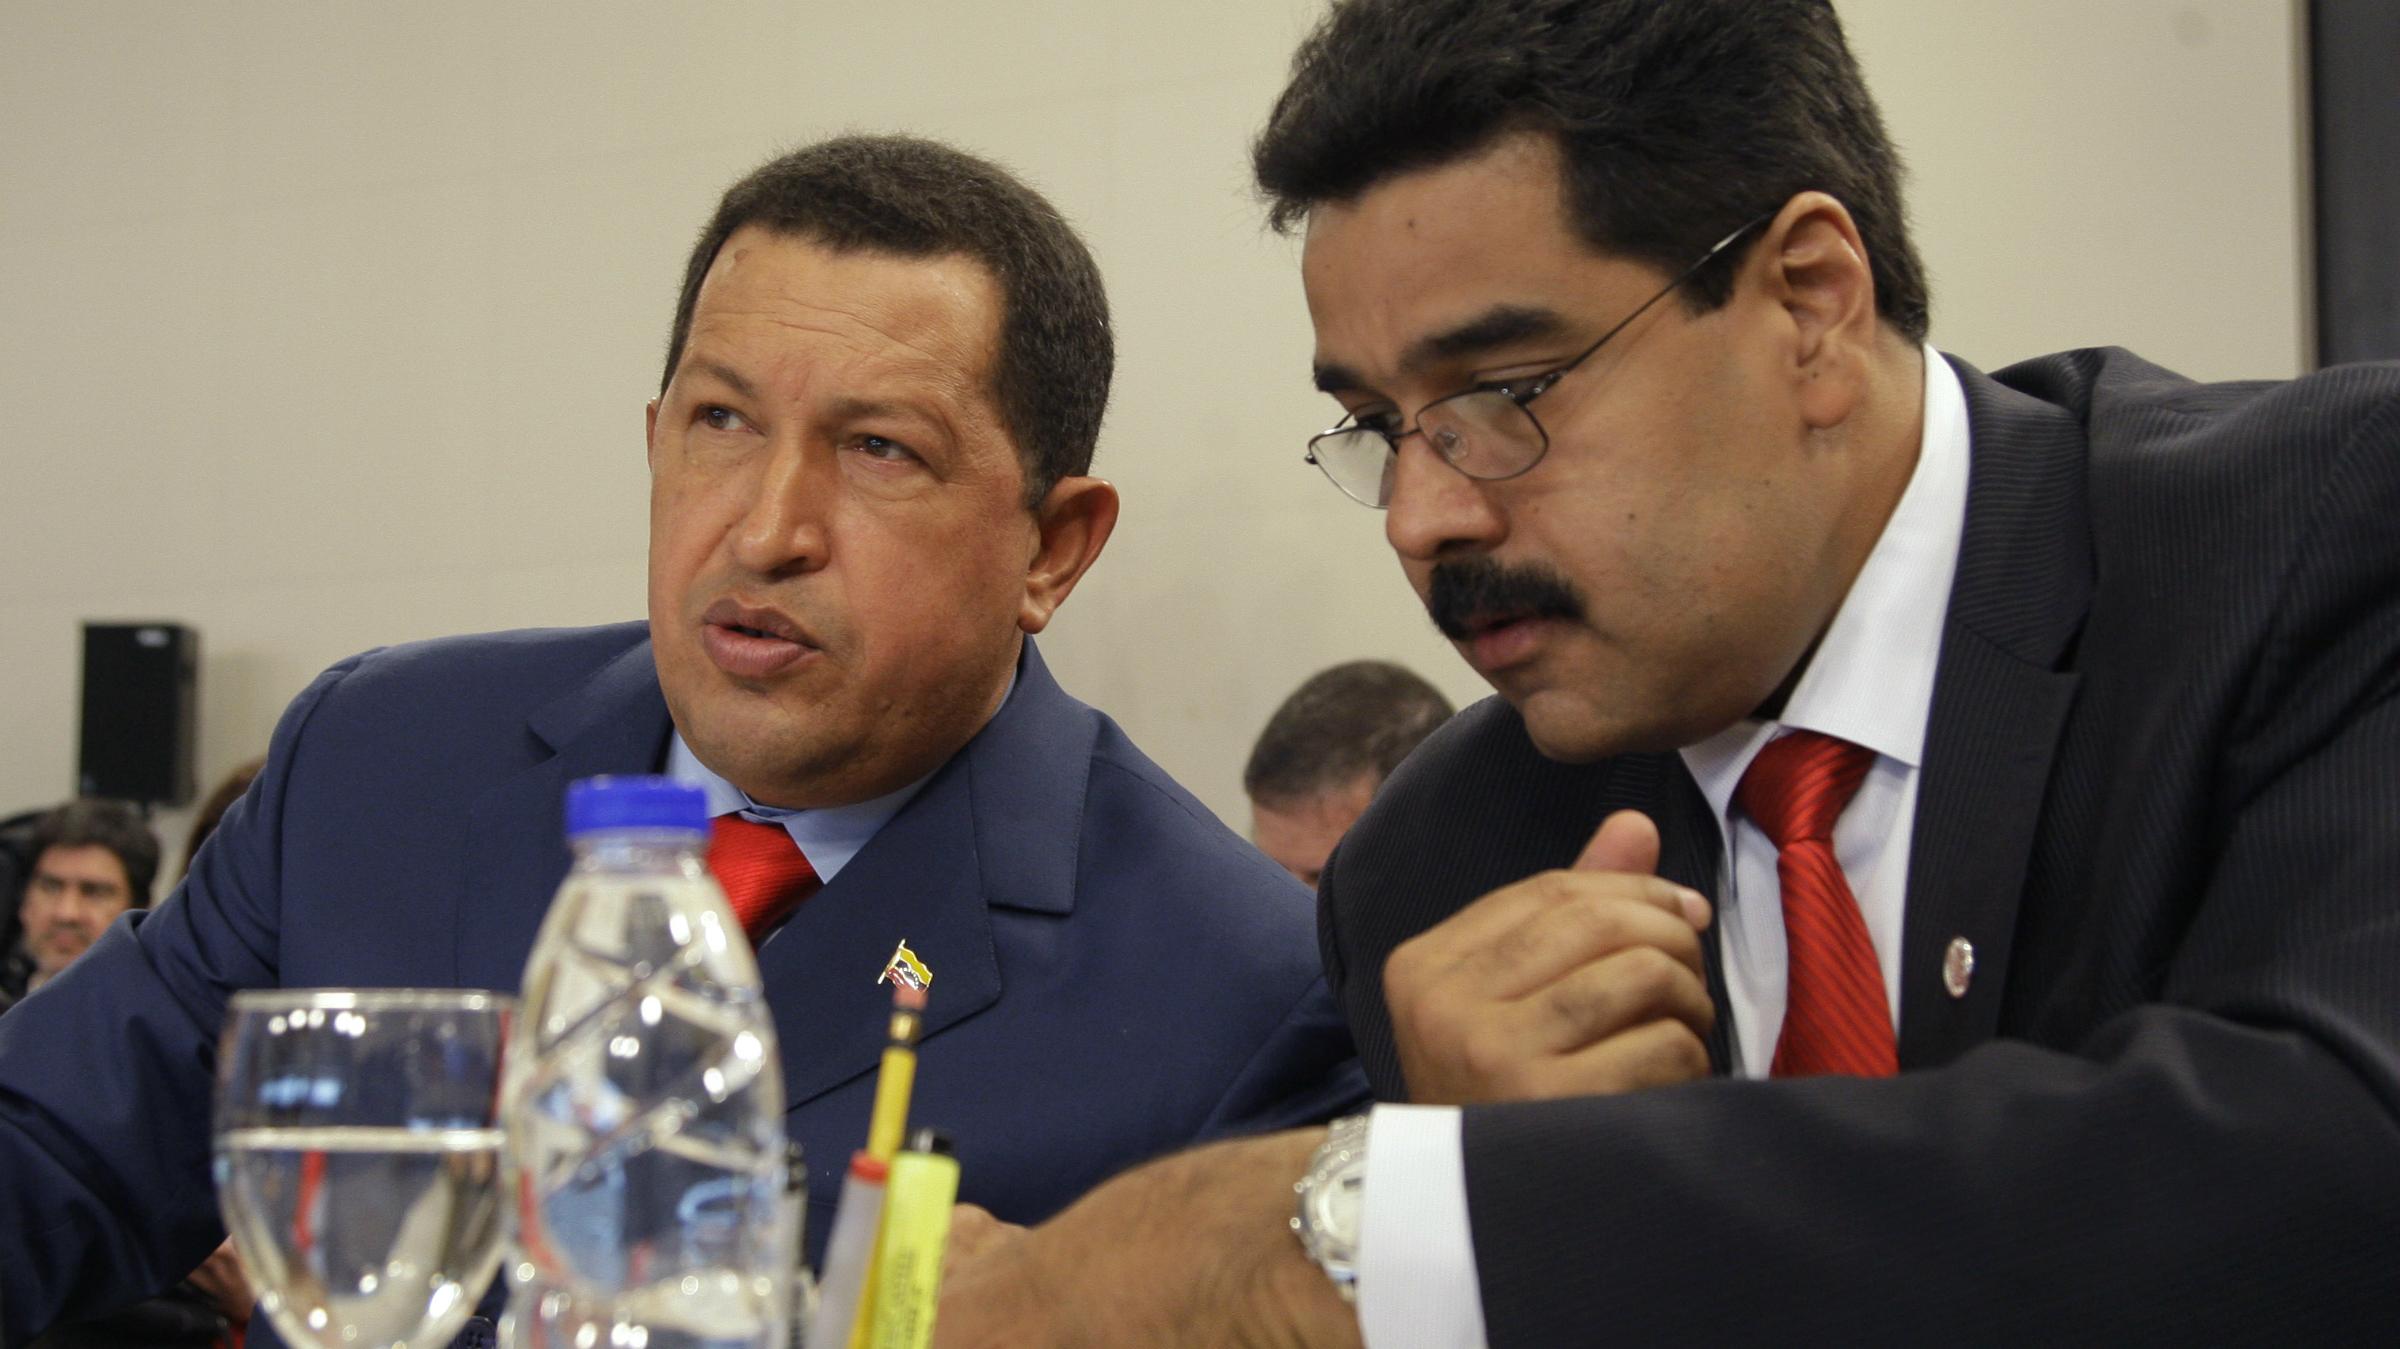 Nicolas Maduro and Hugo Chávez